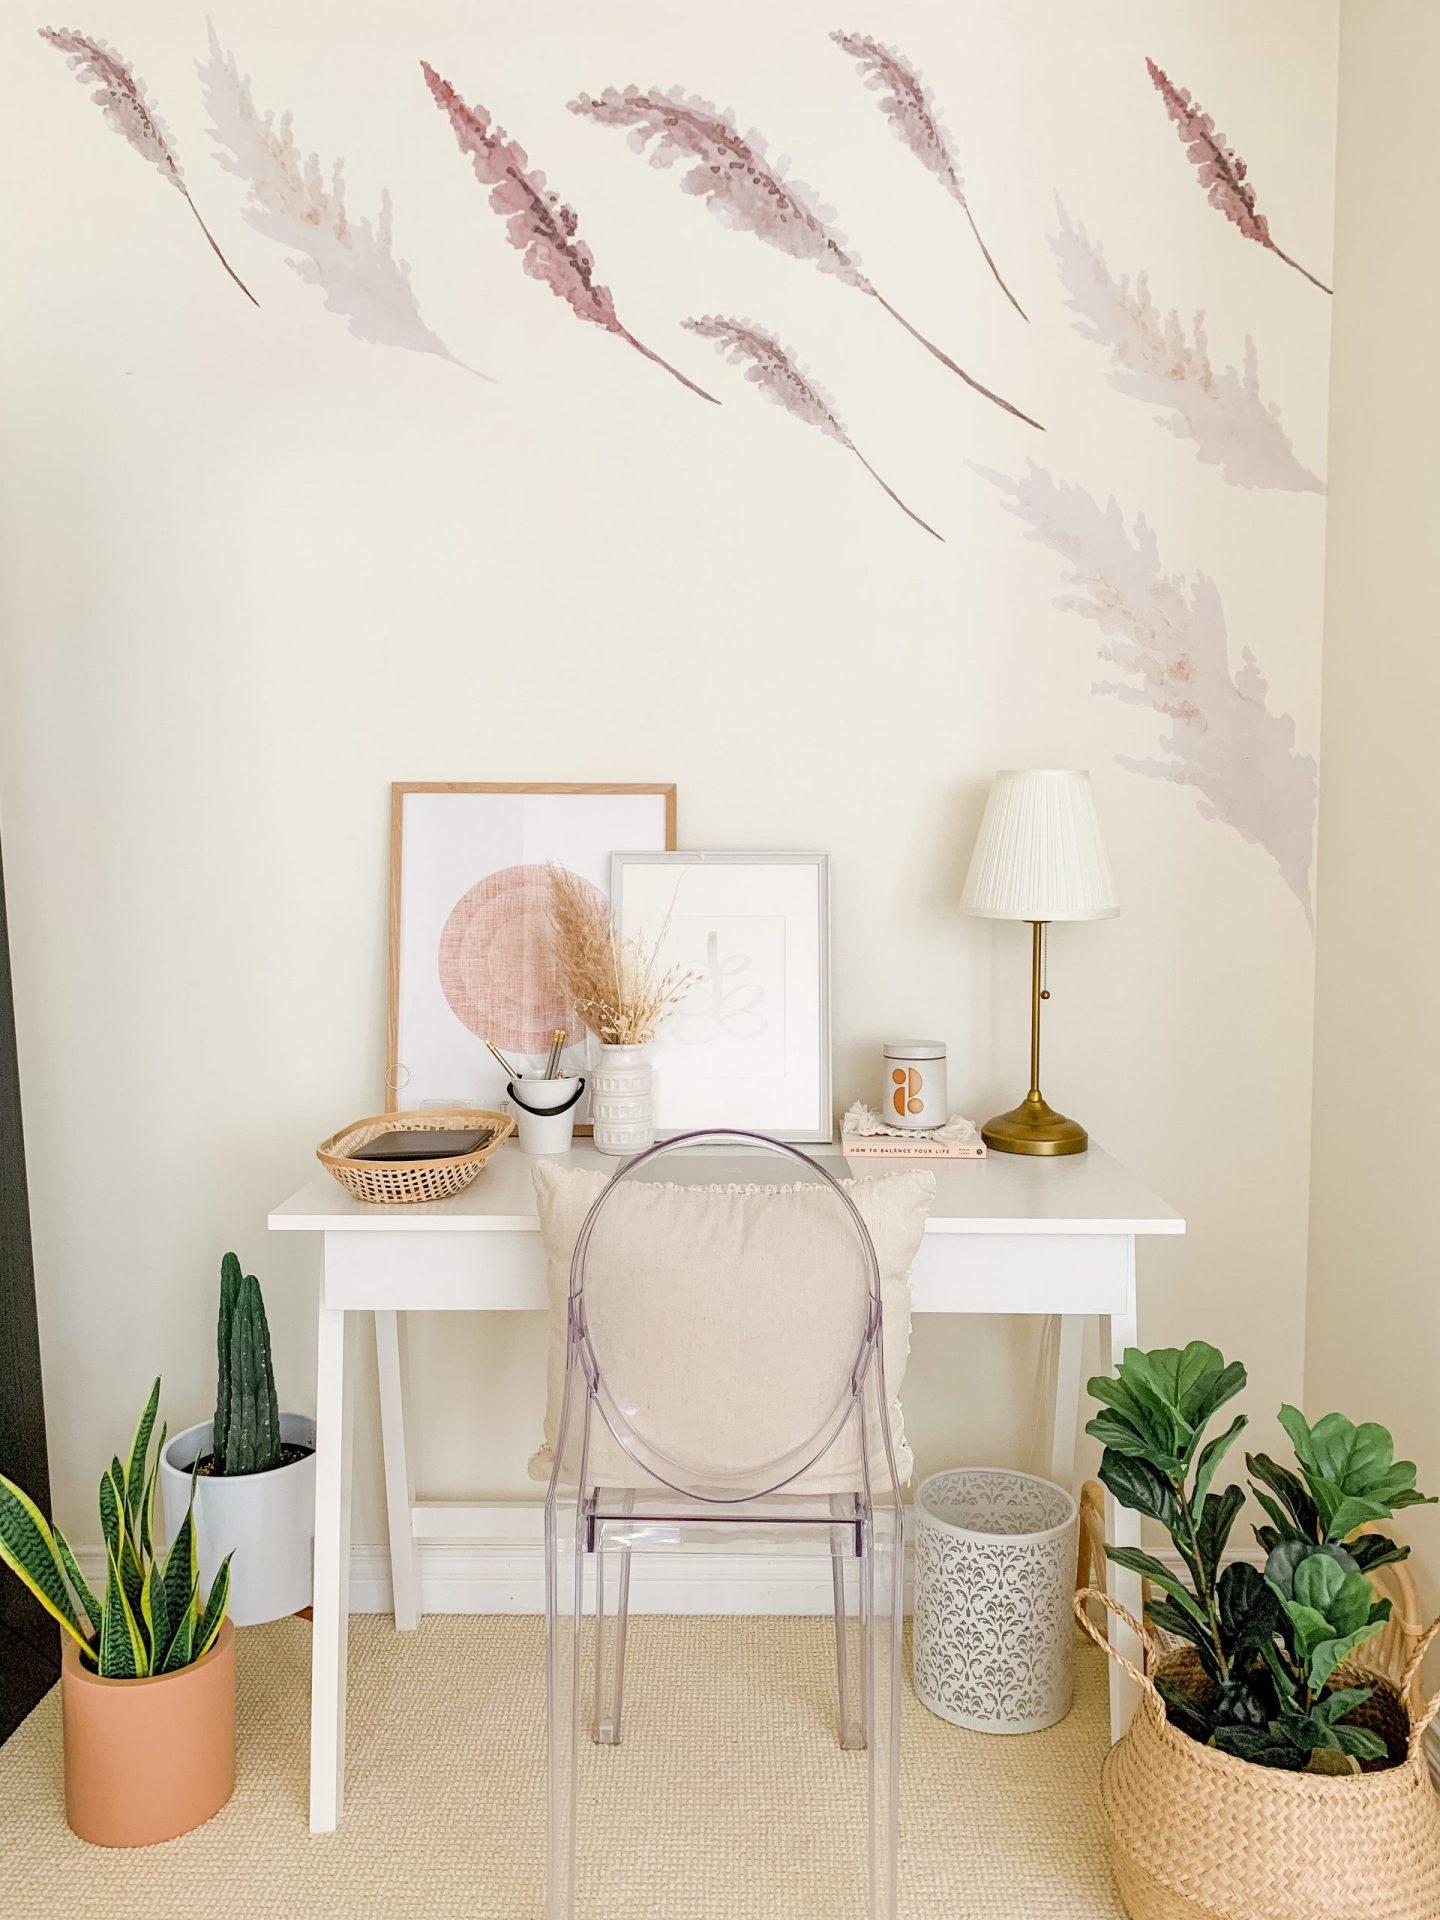 Simple Tips to Create a Dreamy Boho Home Office